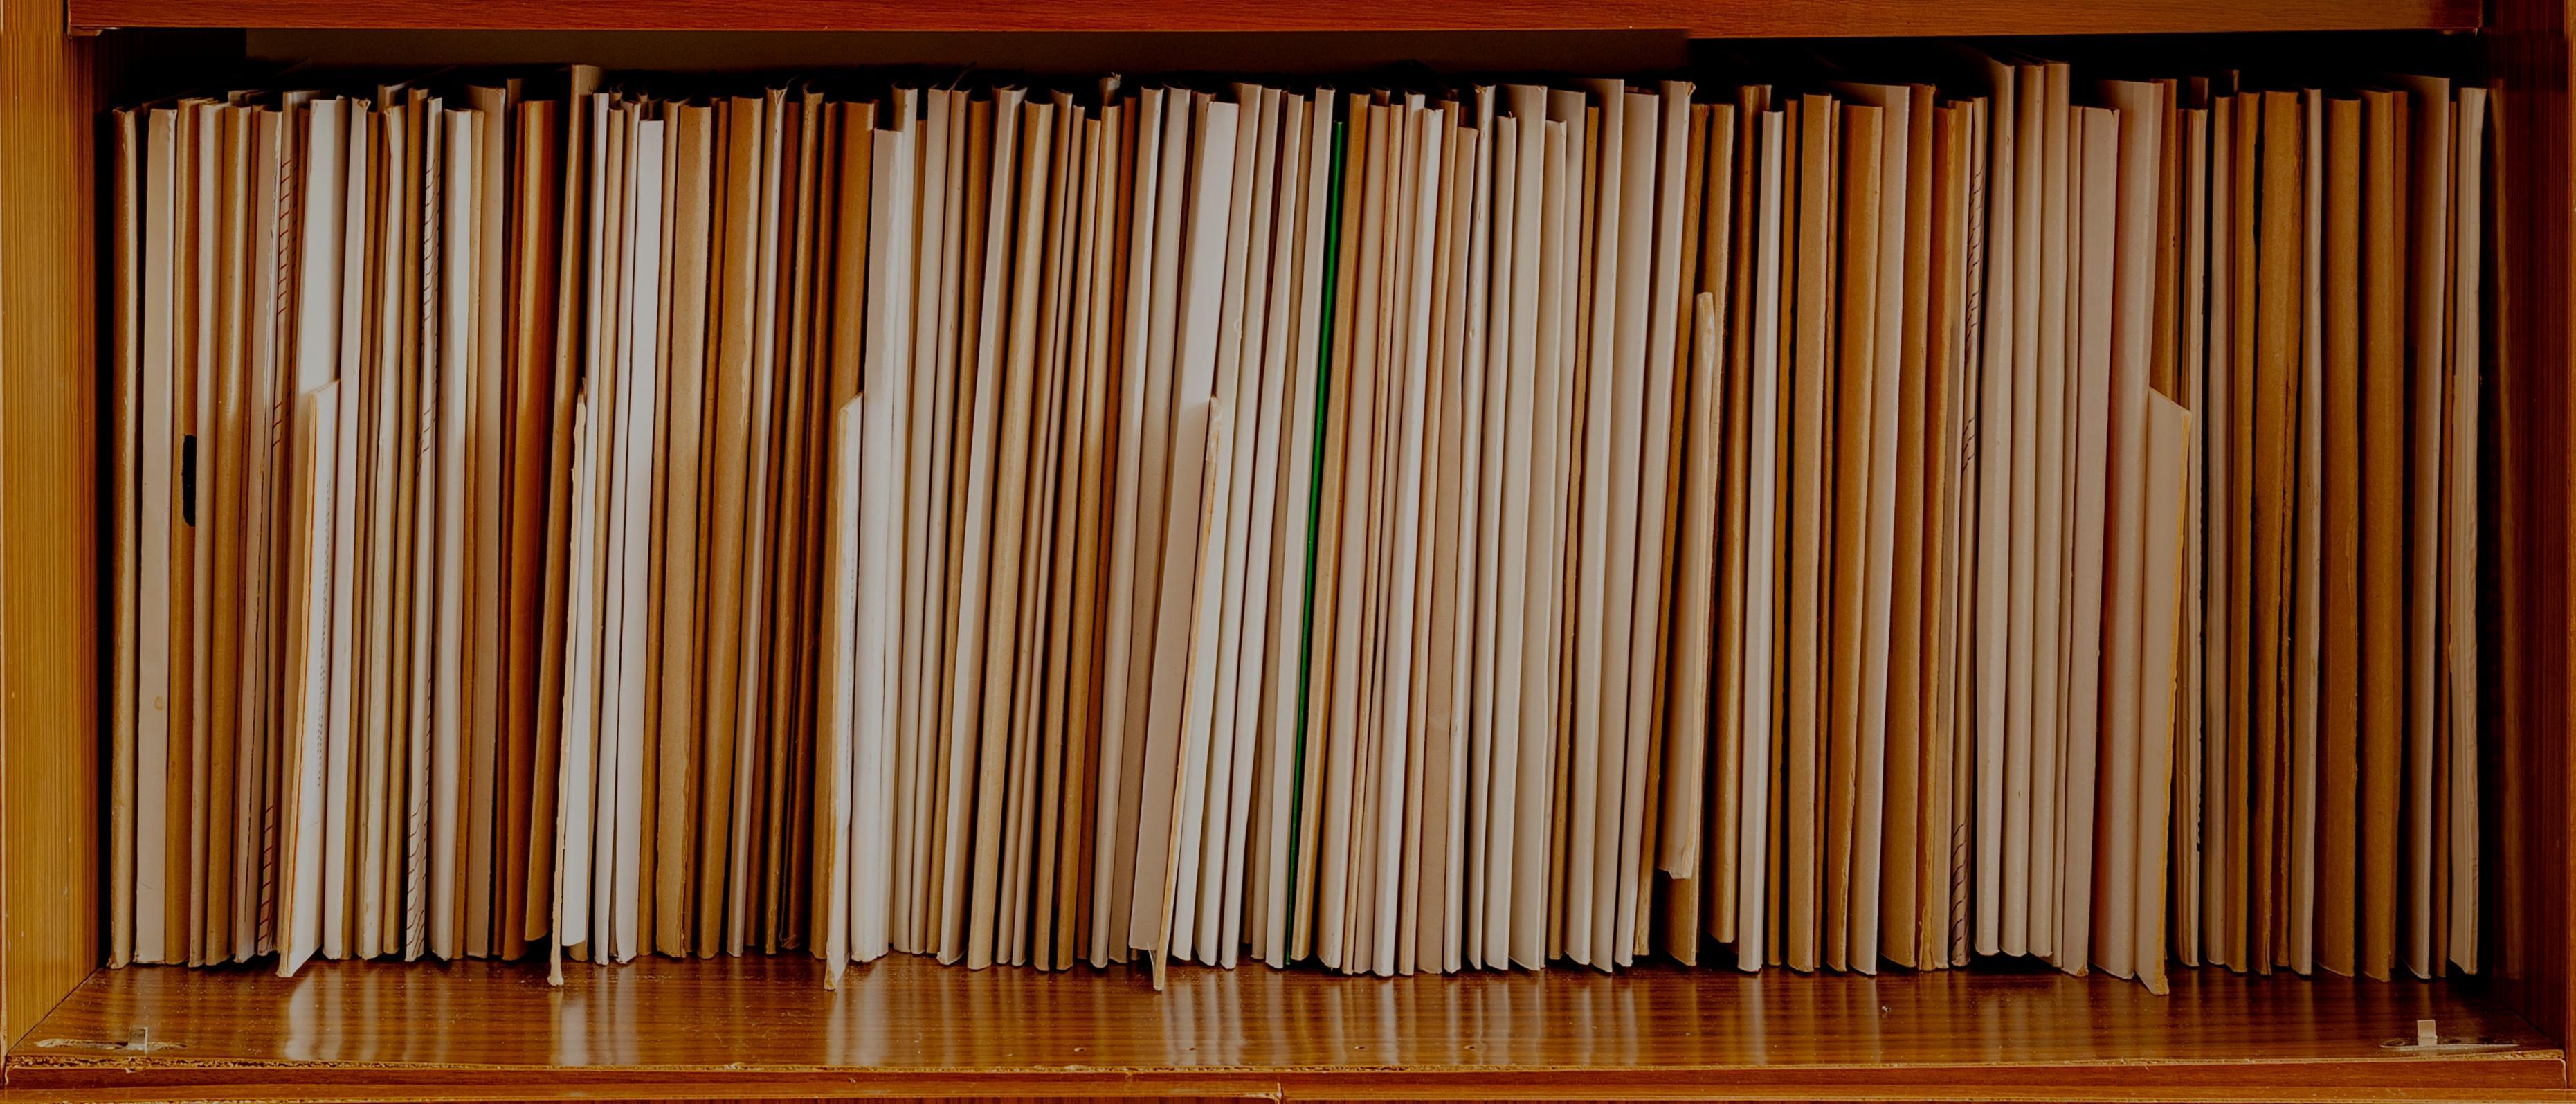 custom-Custom_Size___bigstock-Keeping-Records-On-Brown-Shelv-91516226-1